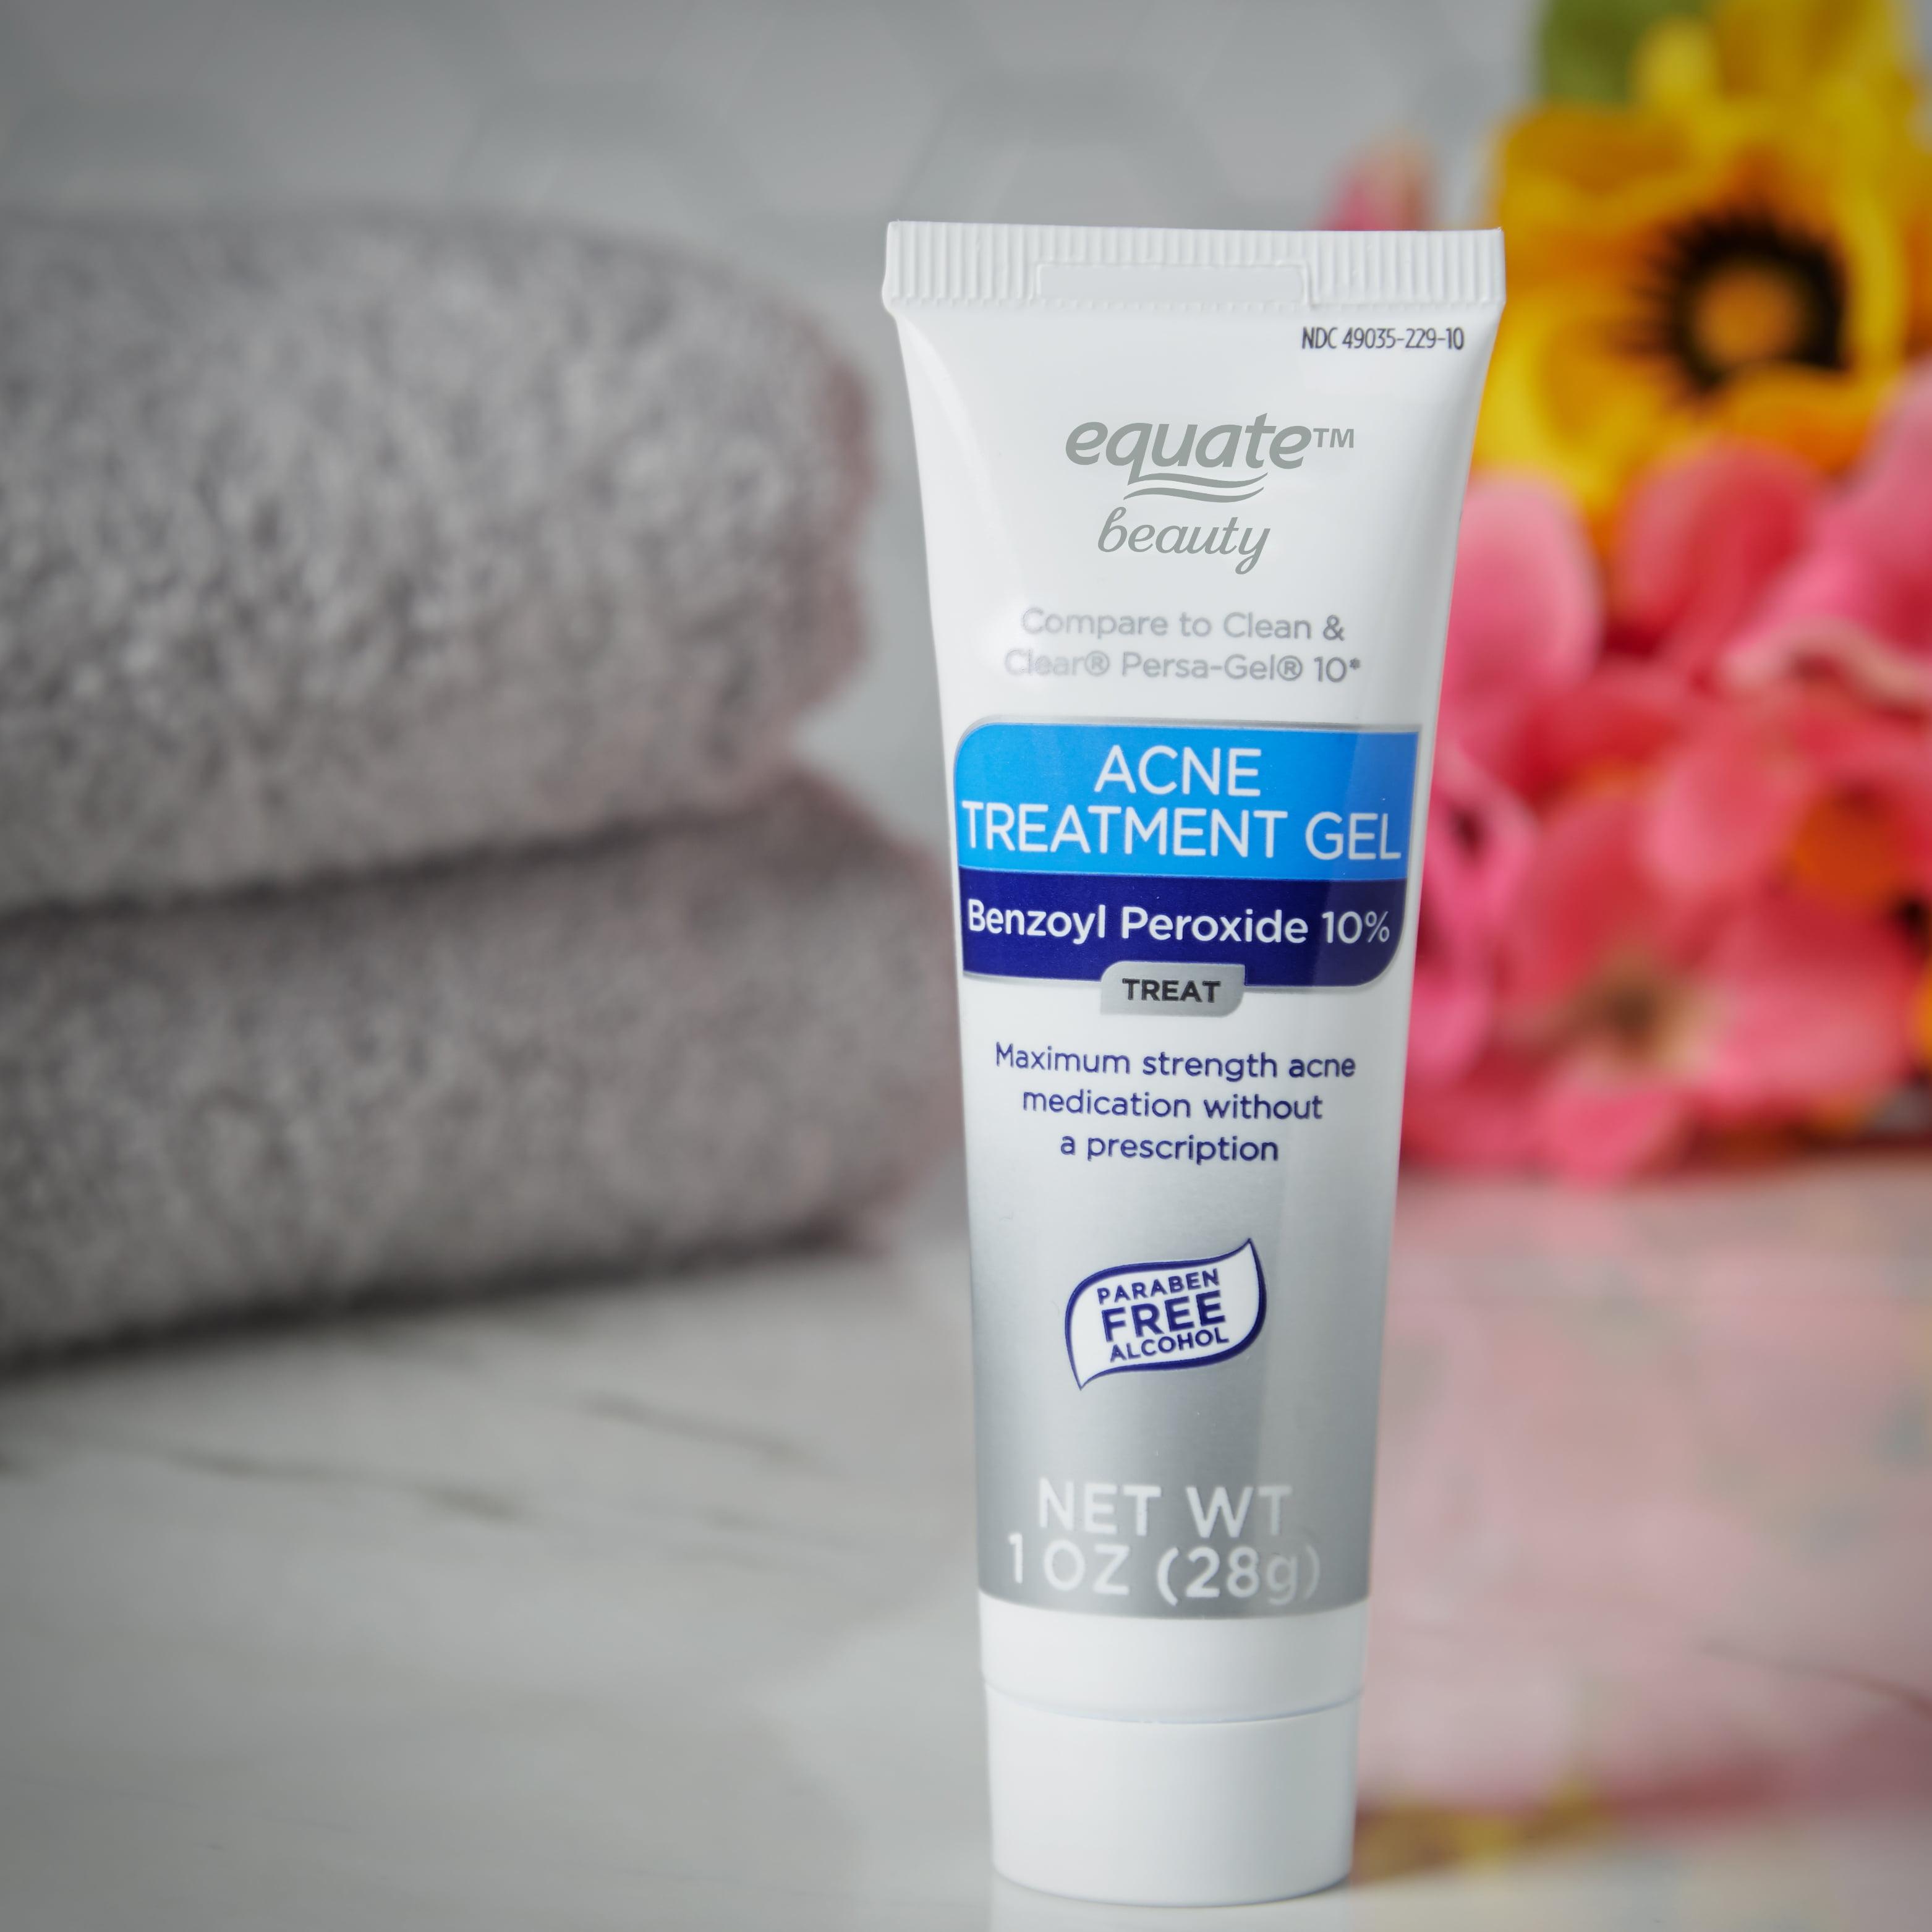 (2 Pack) Equate Beauty 10% Benzoyl Peroxide Acne Treatment Gel, 1 Oz